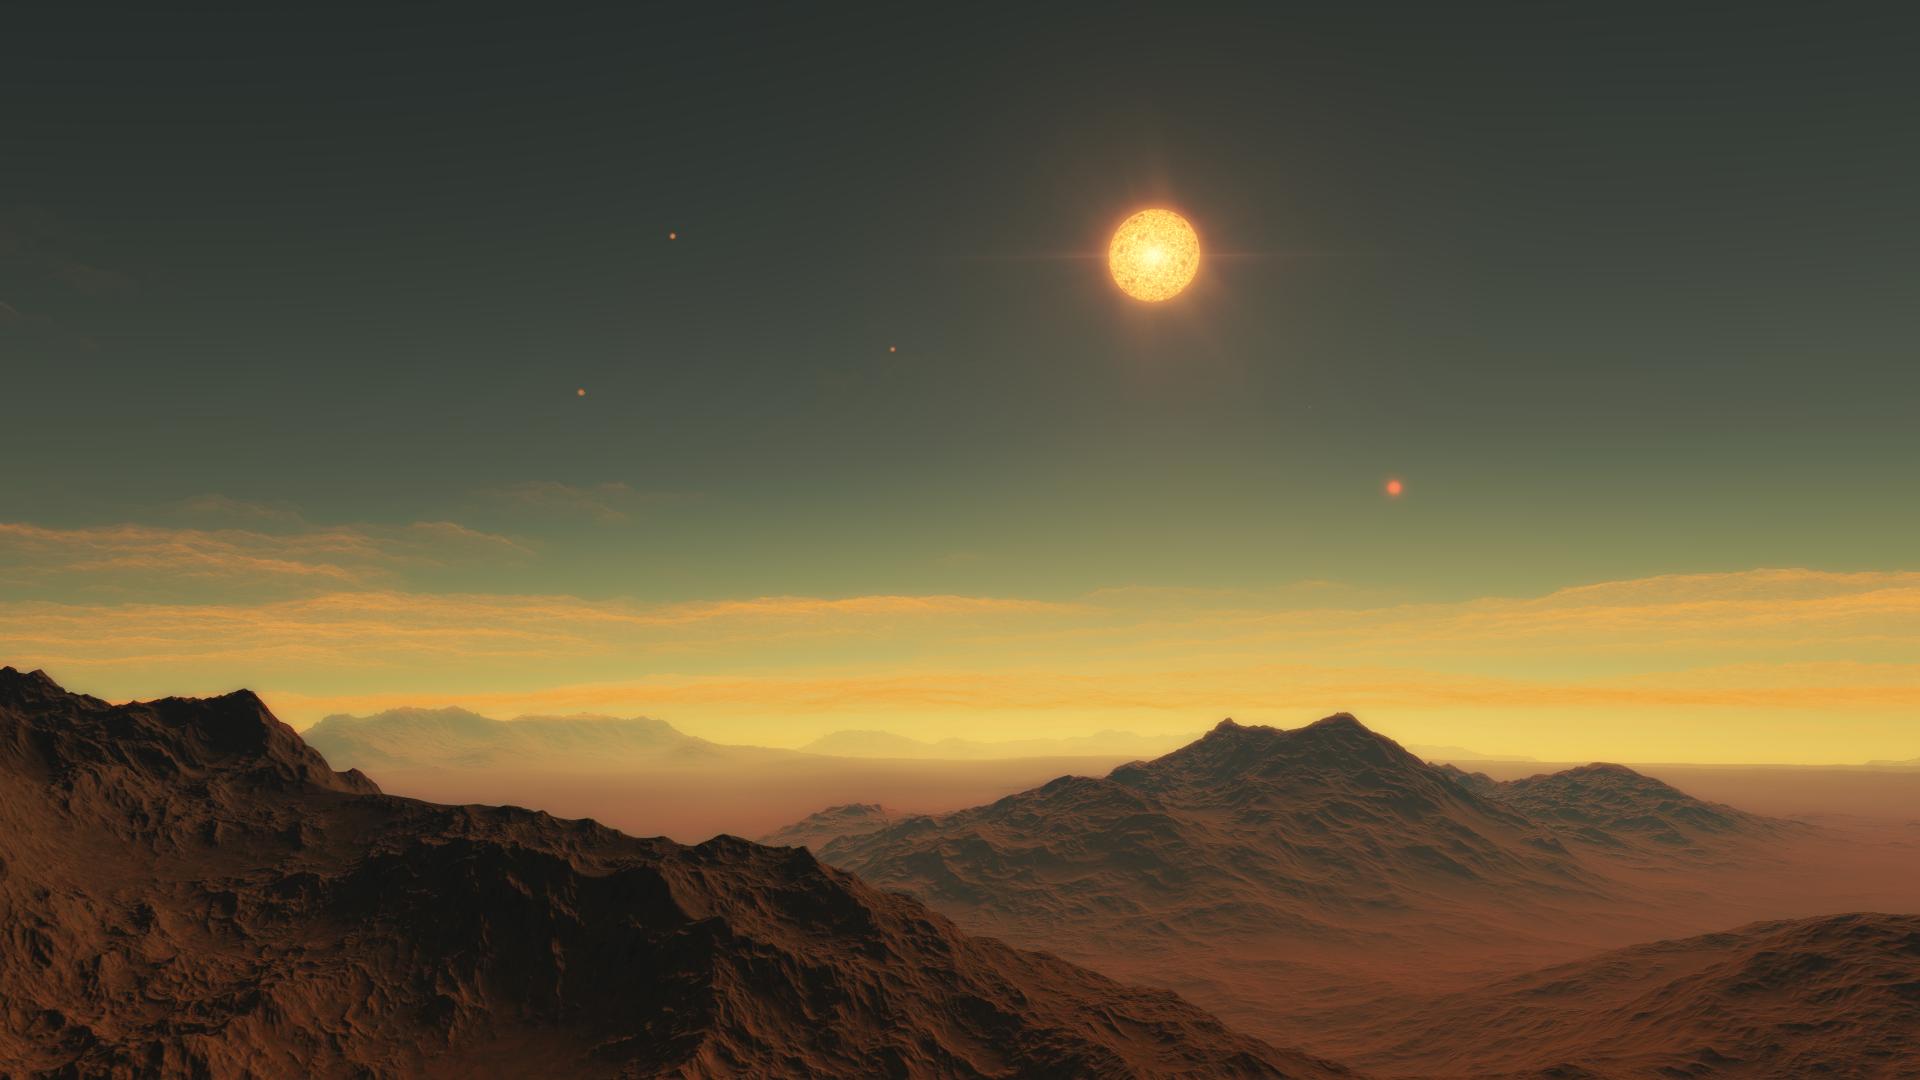 M4V stellar class red dwarf+binary brown dwarfs #1 by nirklars